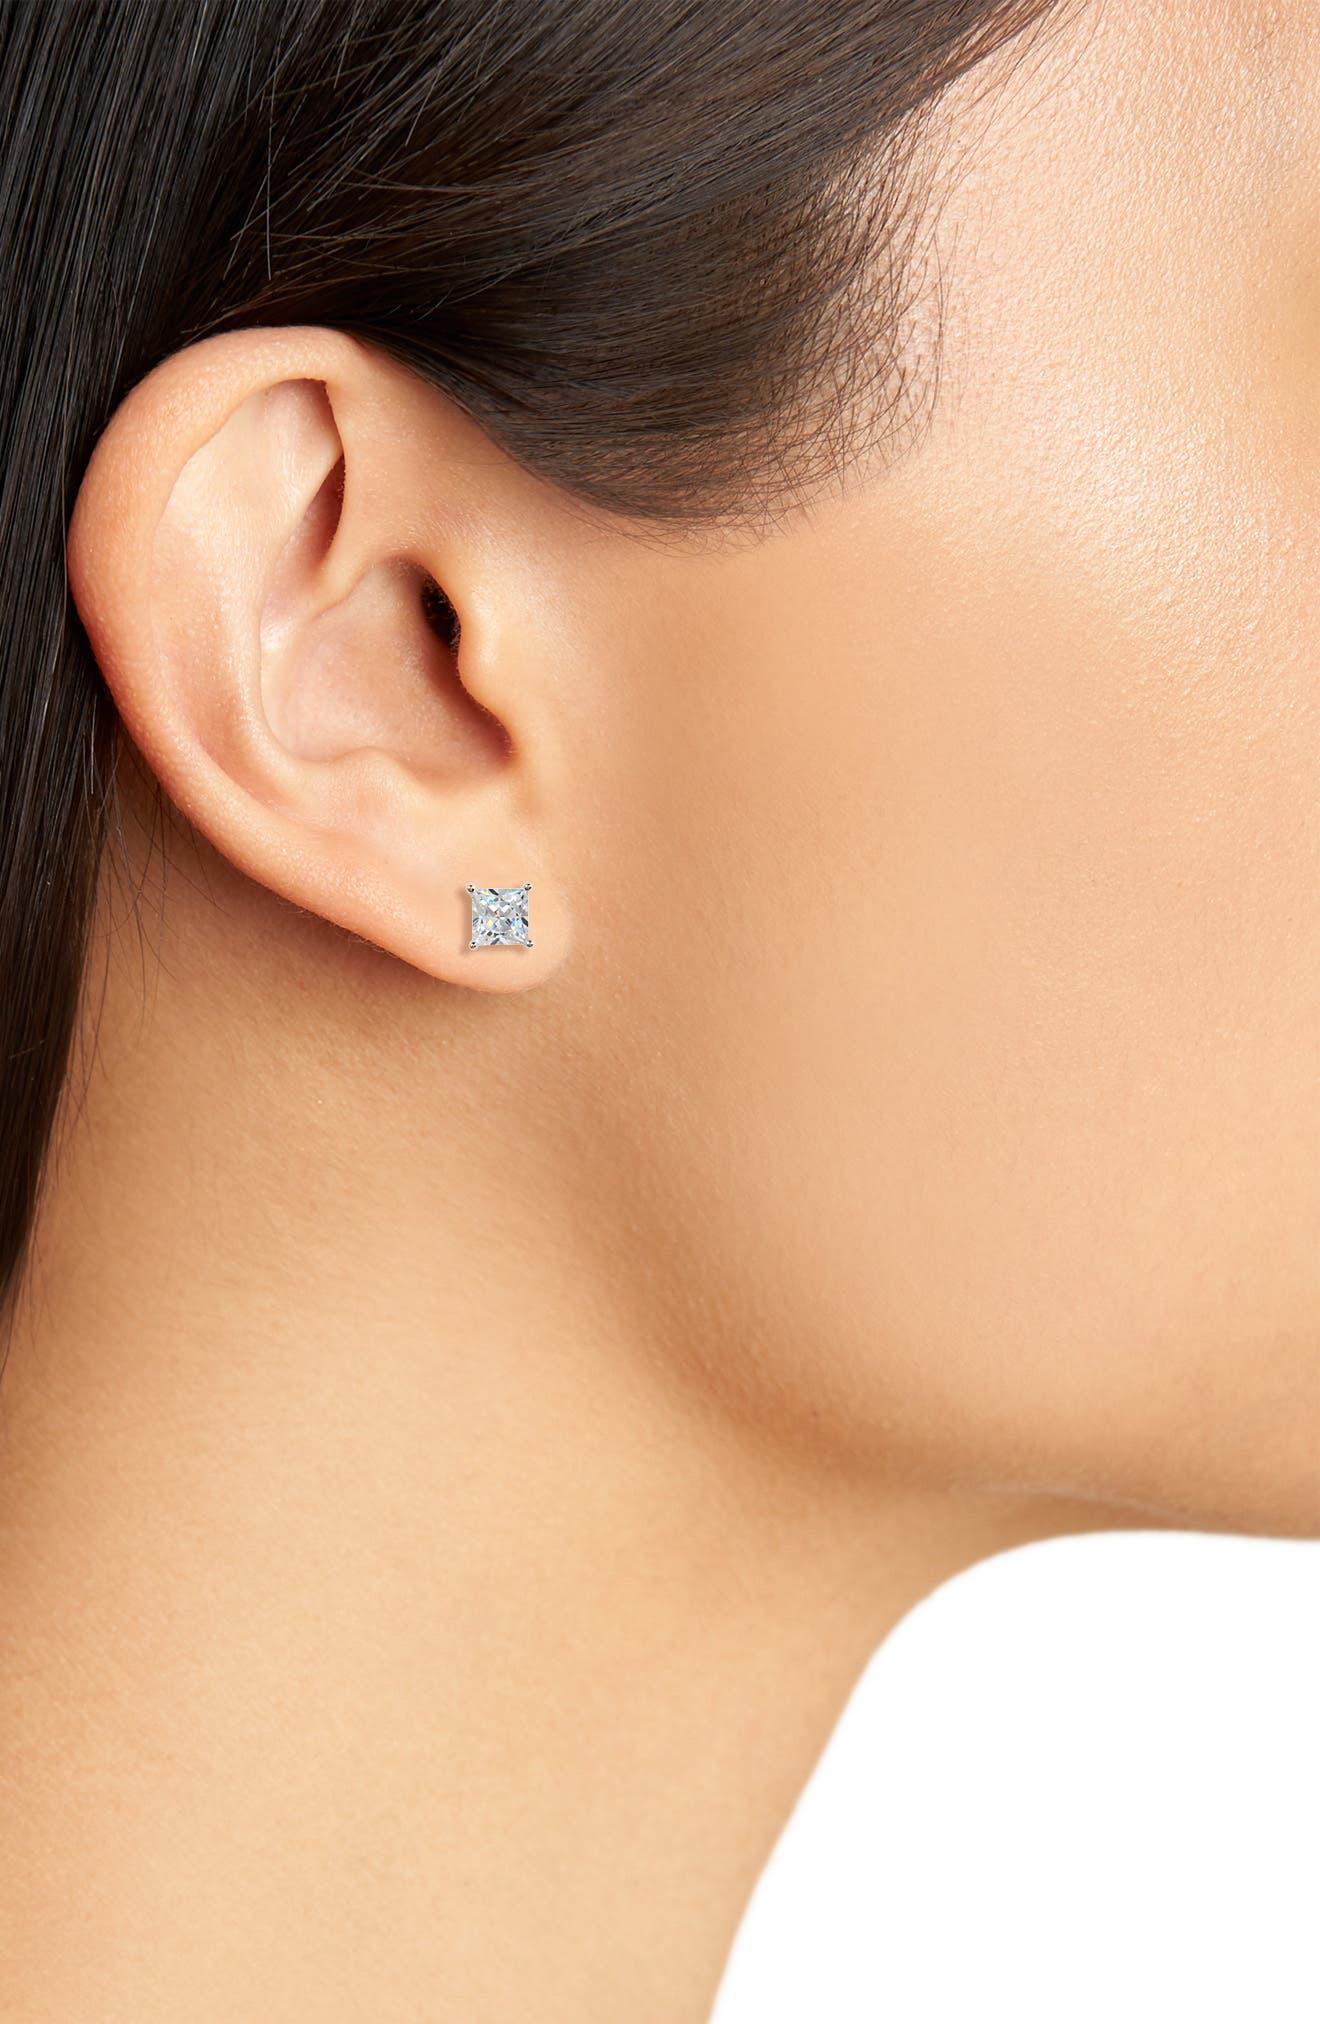 2ct tw Princess Cut Stud Earrings,                             Alternate thumbnail 2, color,